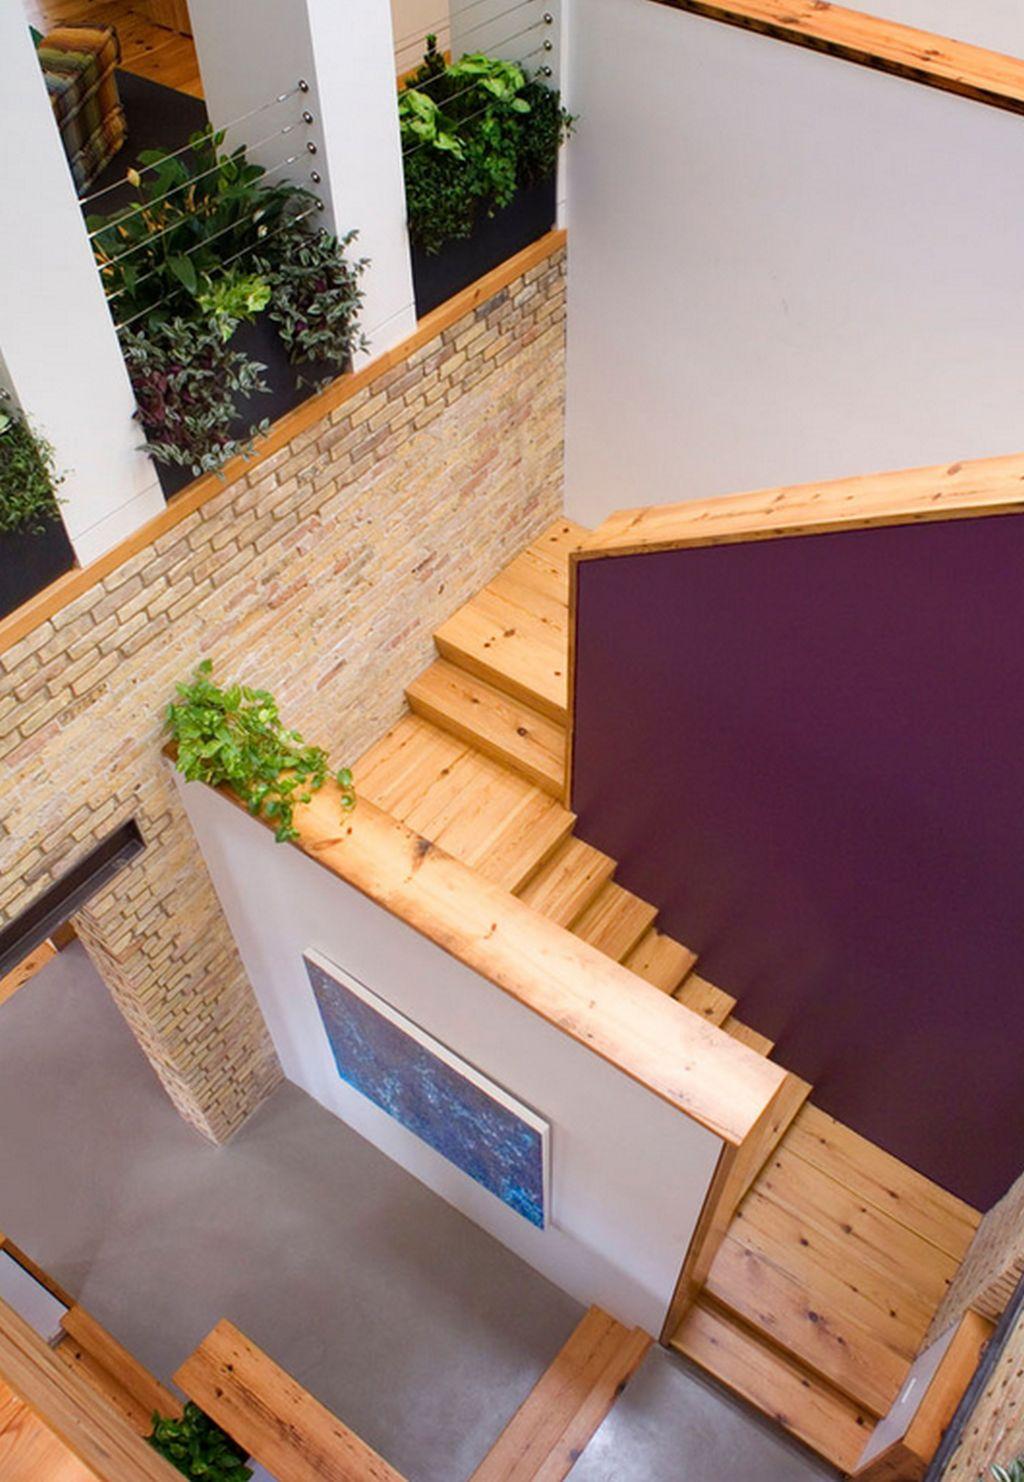 adelaparvu.com despre scoala transformata in casa Design SGW Architects (19)